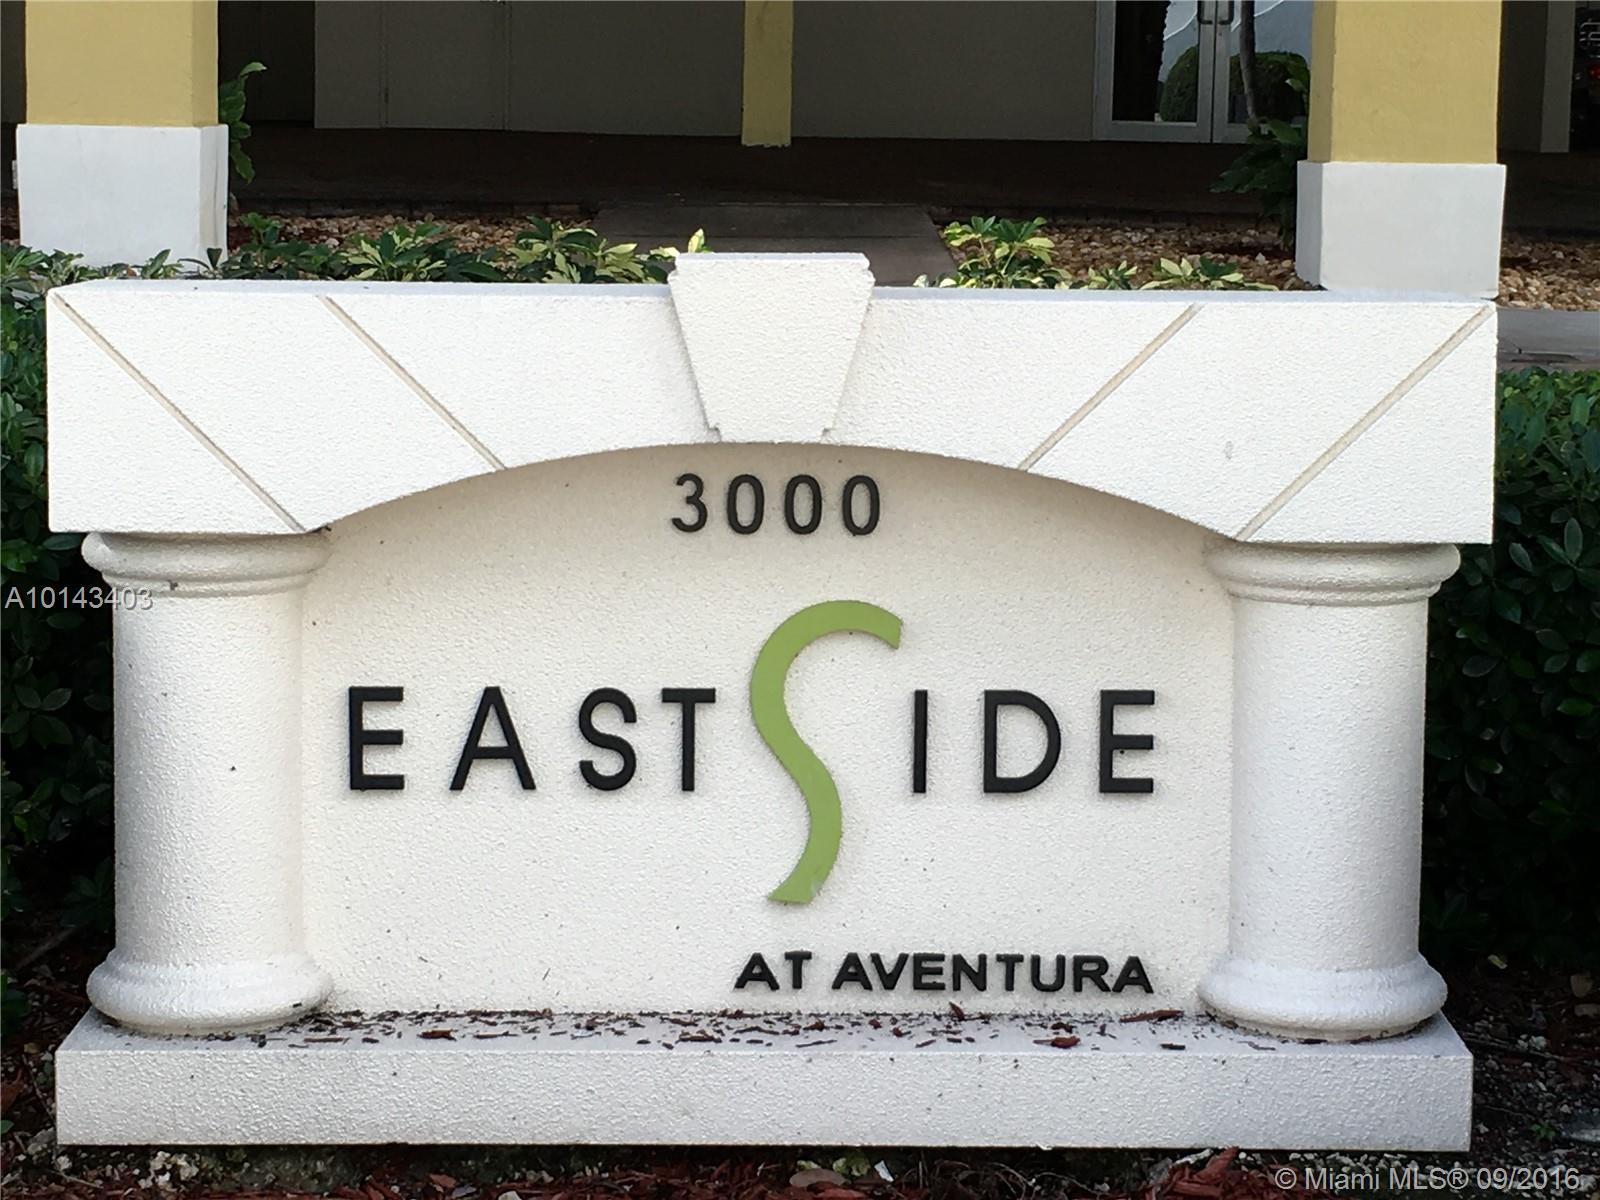 Eastside at Aventura